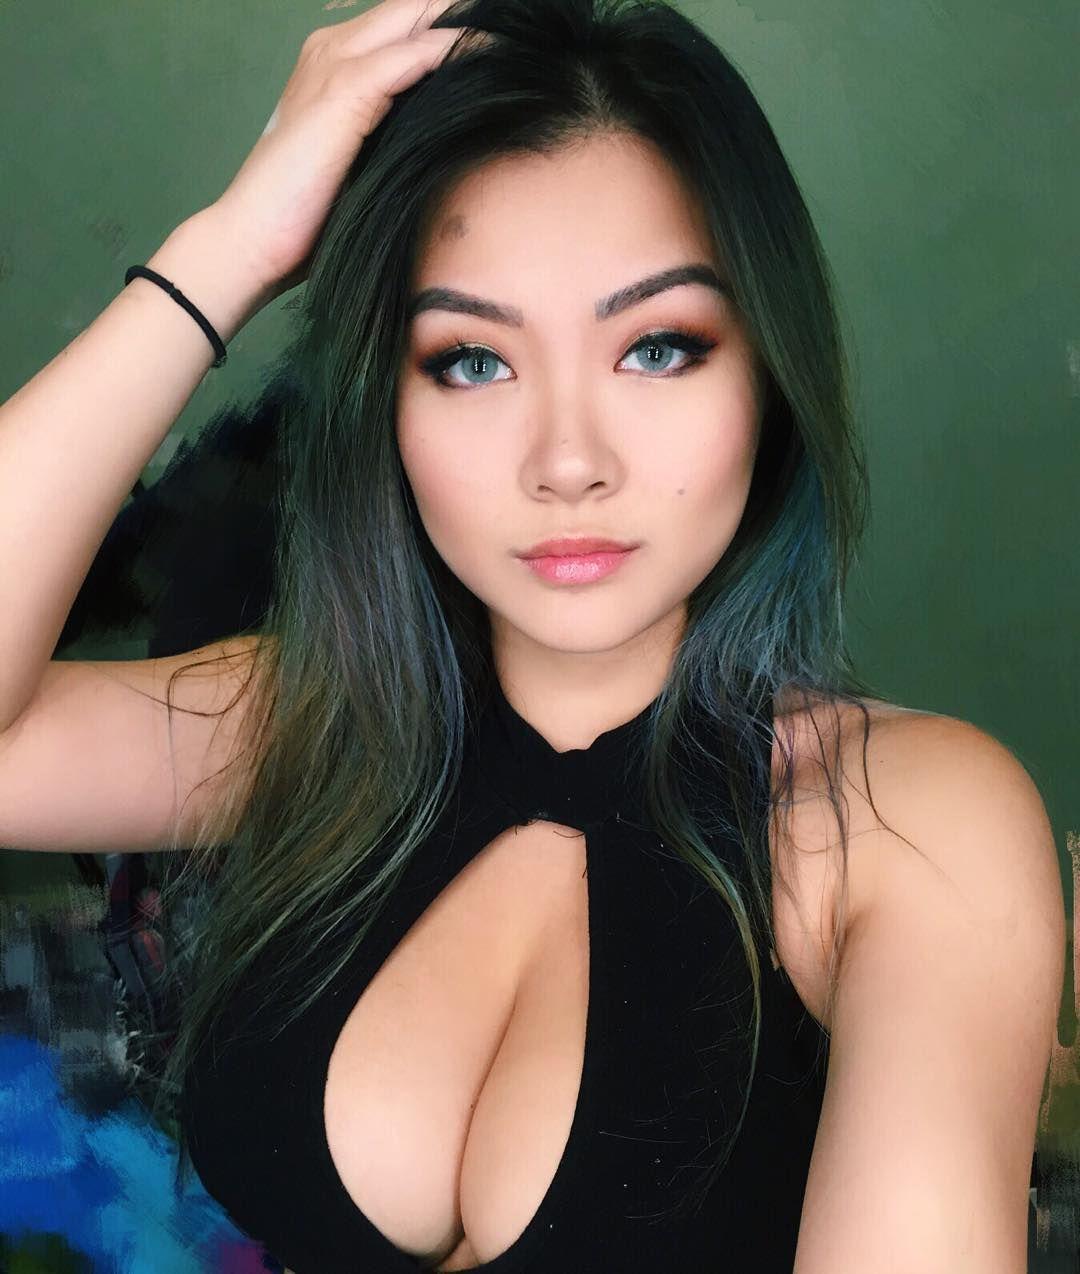 Fake Boobs Shes